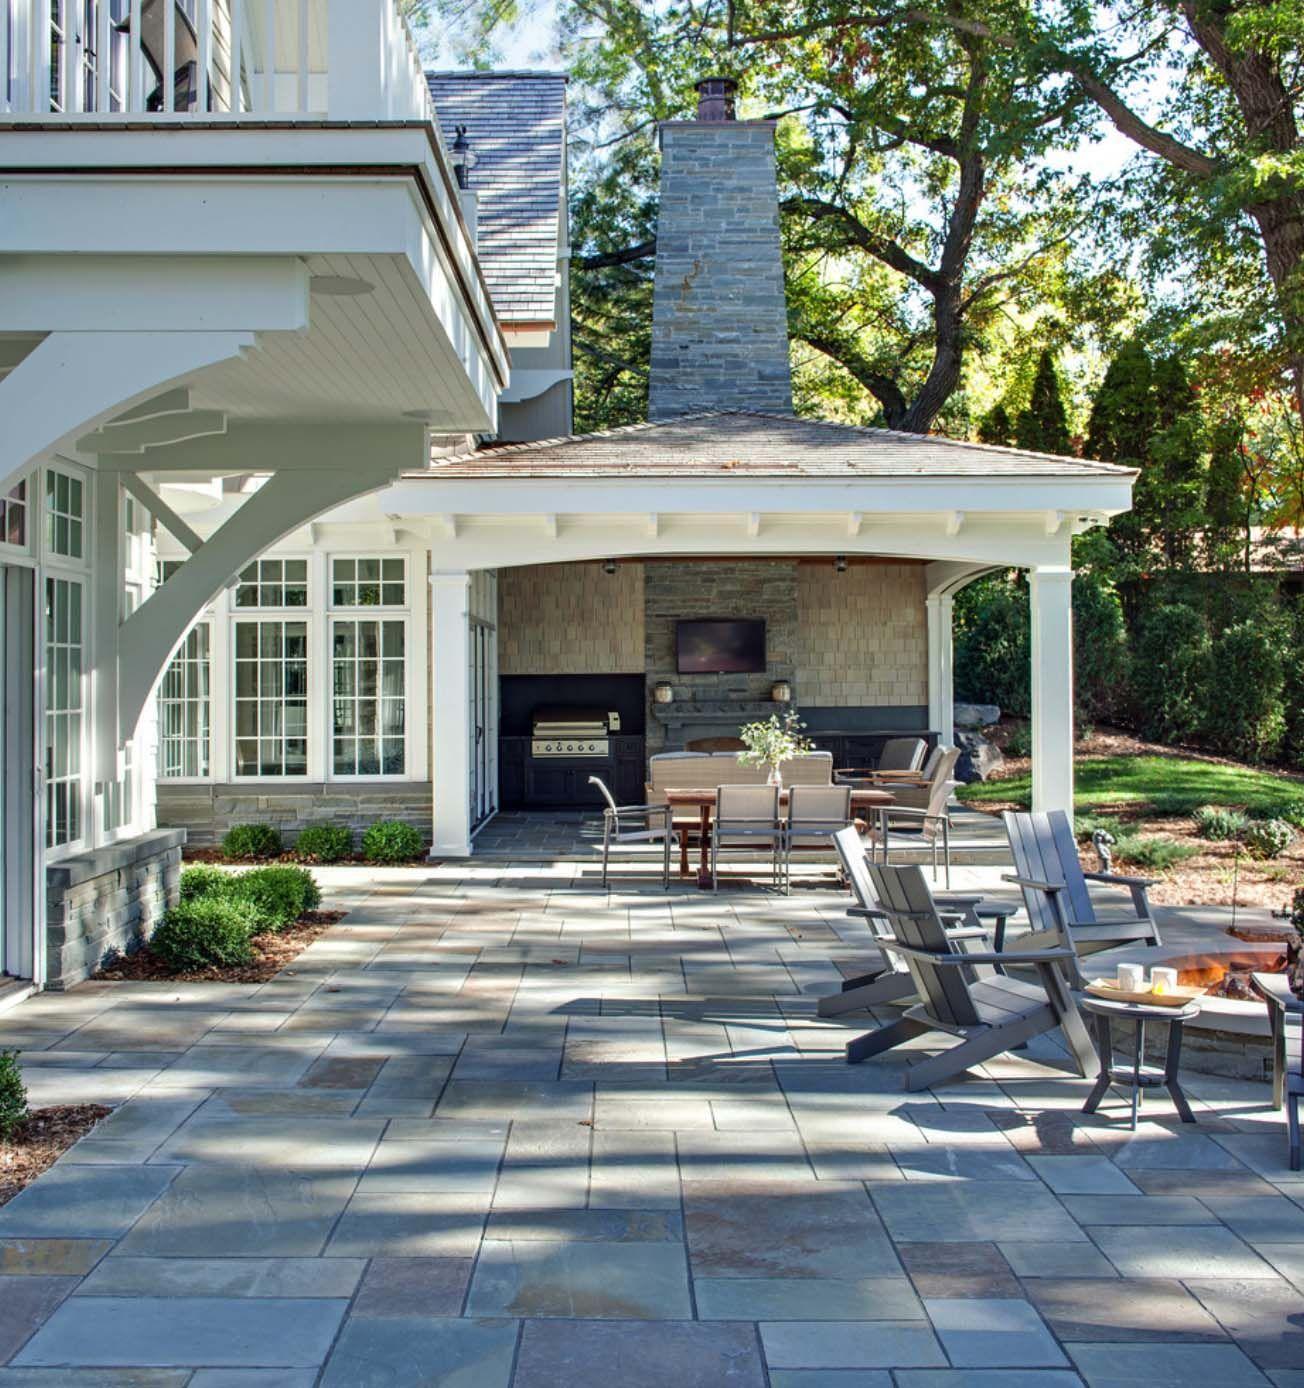 Shingle Garden Designs: Breathtaking Shingle-style Residence On Lake Minnetonka